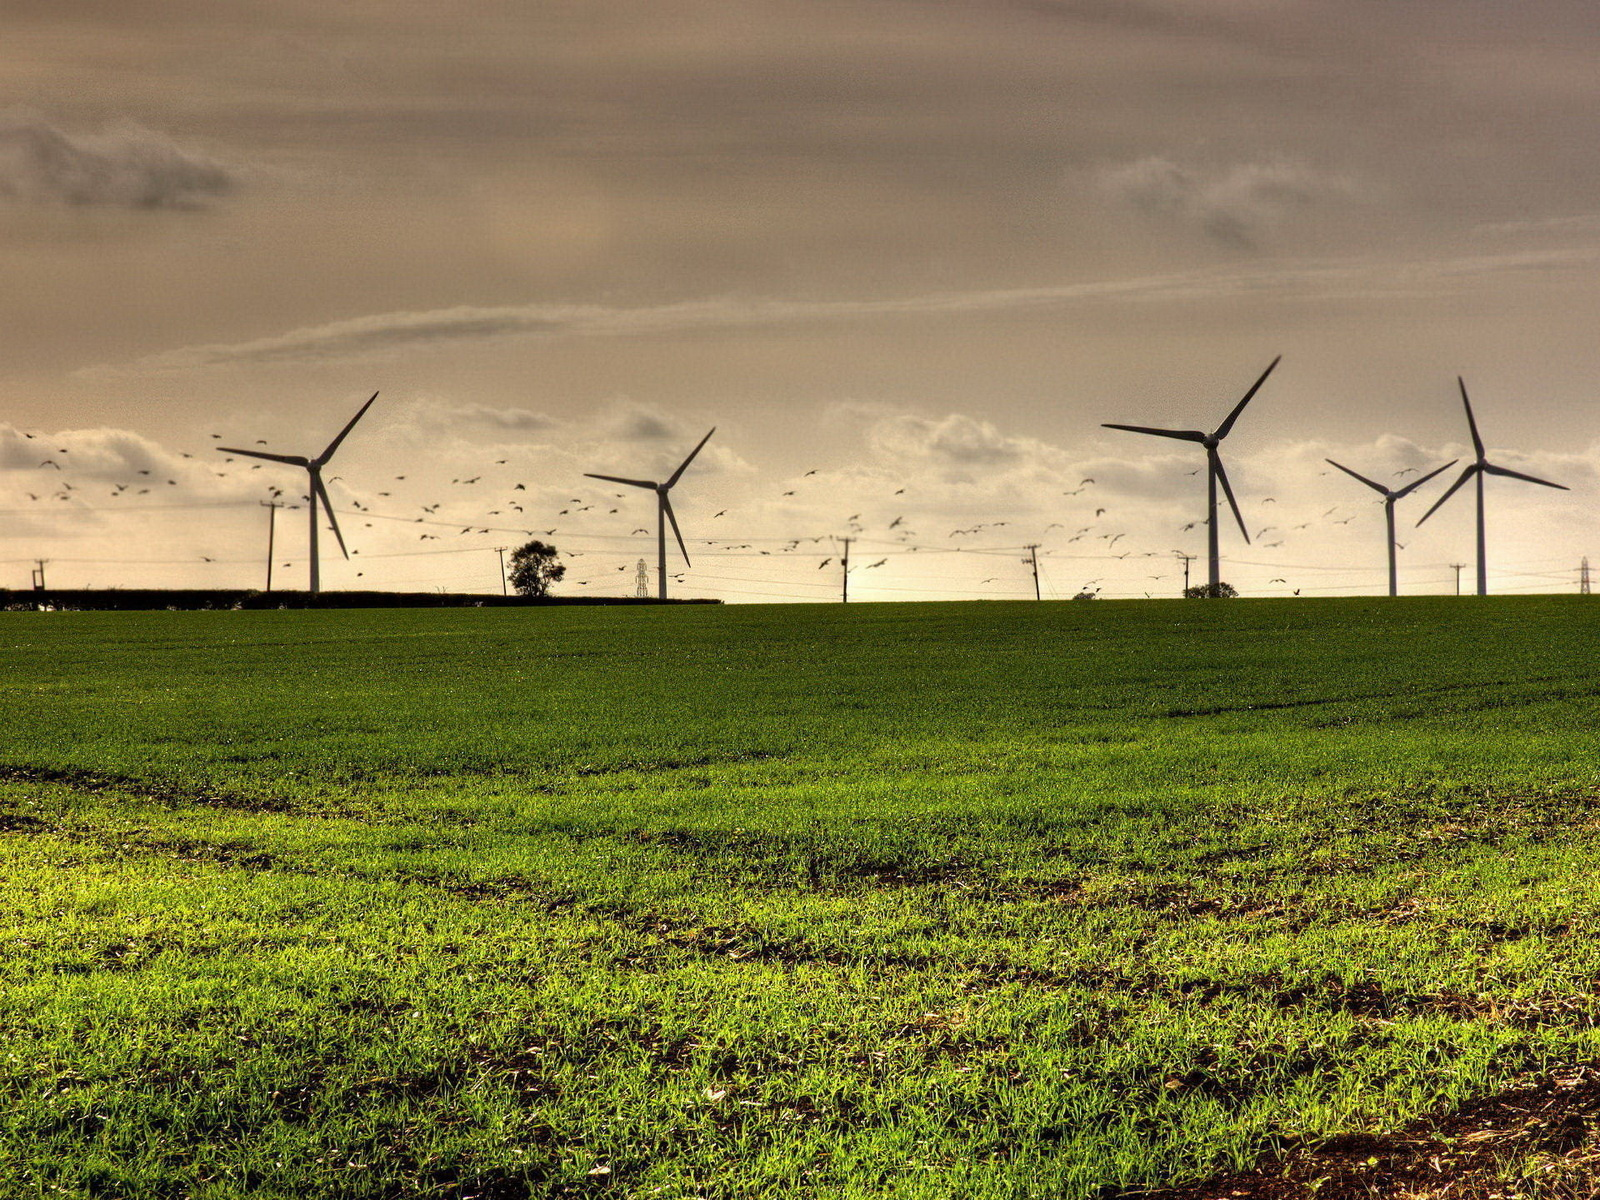 green grass windmill image